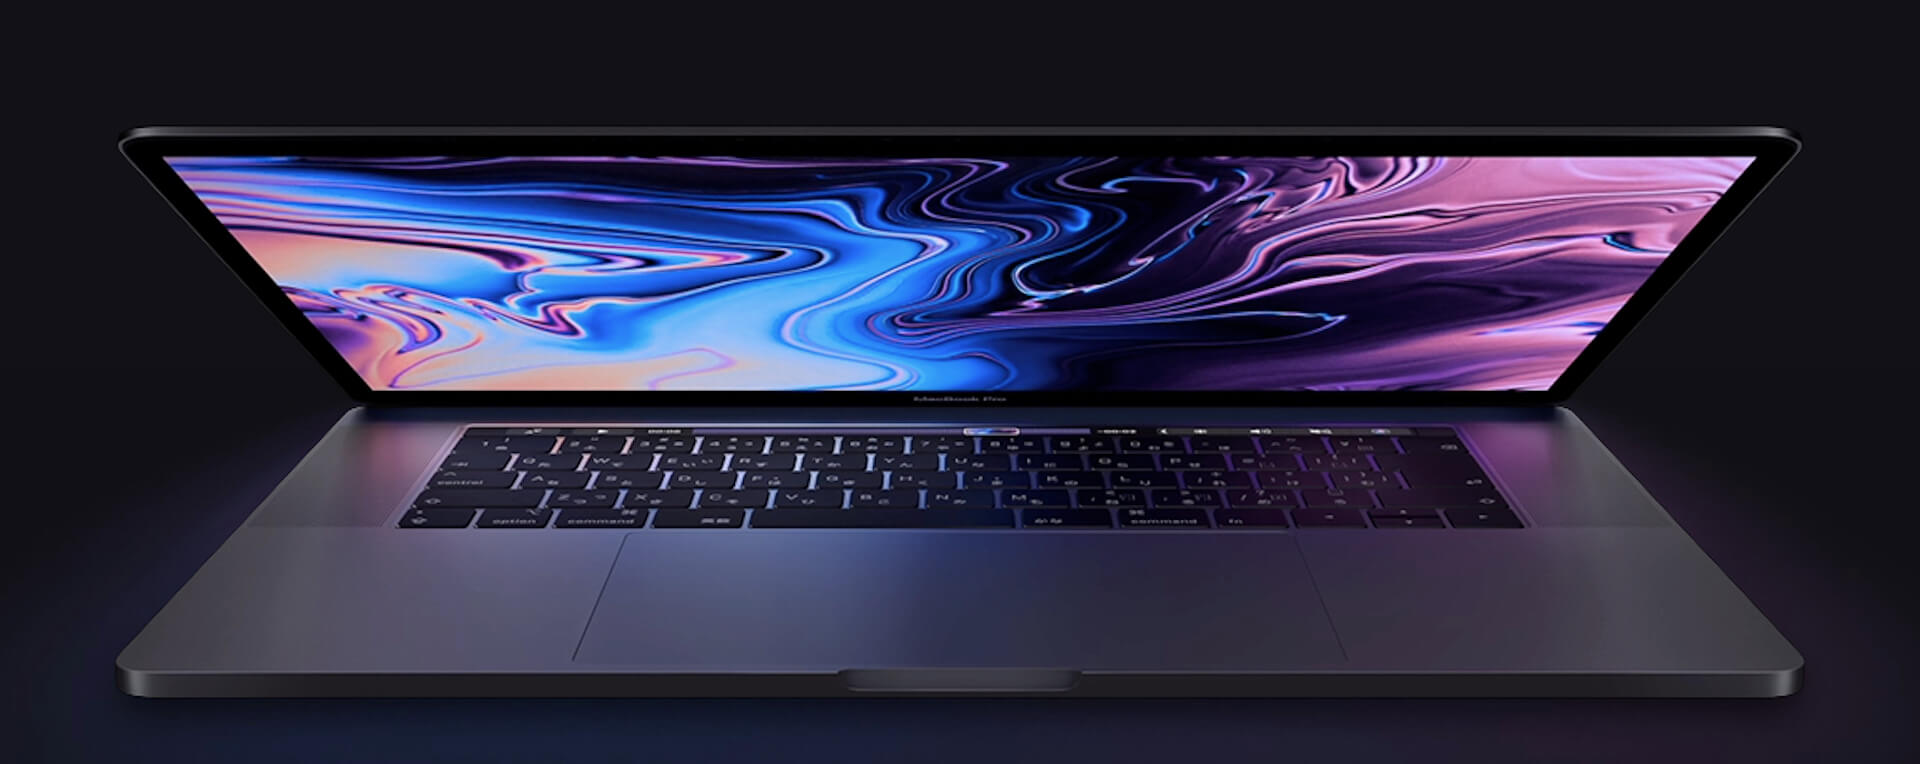 Apple、今週中にMacBook Proの16インチモデルを発表か? tech191112_macbookpro_1